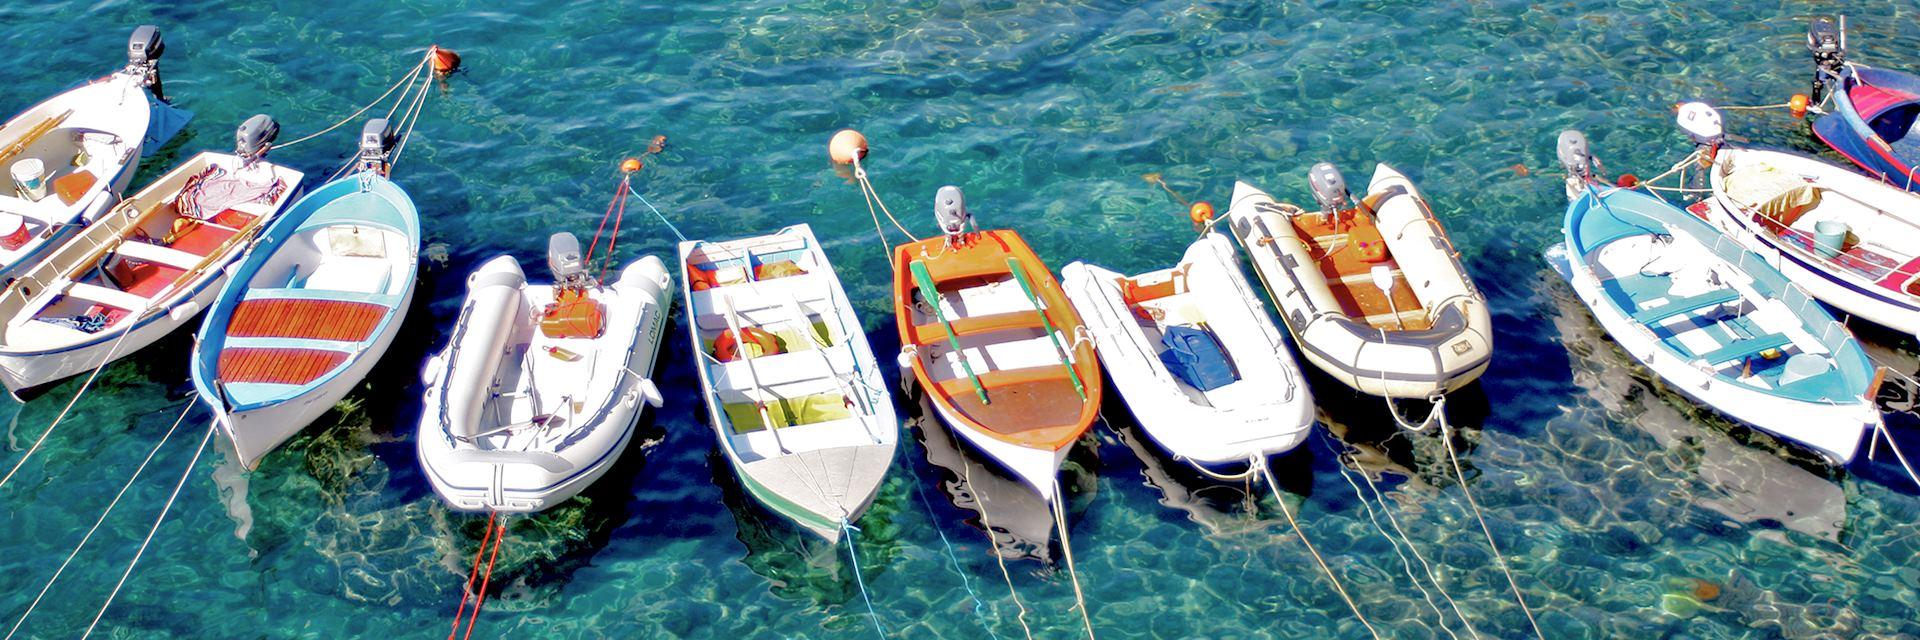 Boats moored, Amalfi Coast